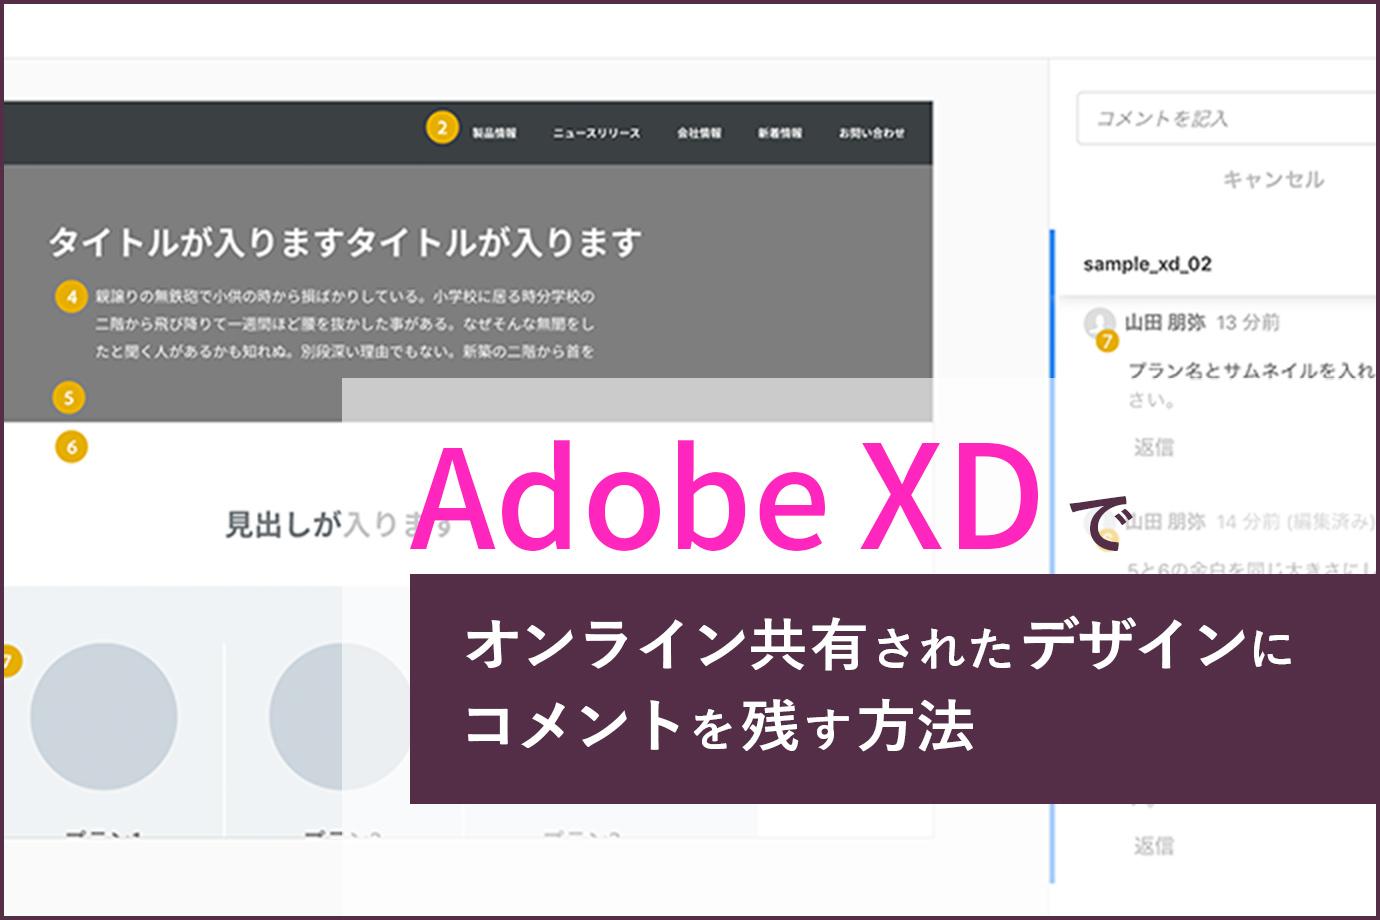 Adobe XDでオンライン共有されたデザインにコメントを残す方法